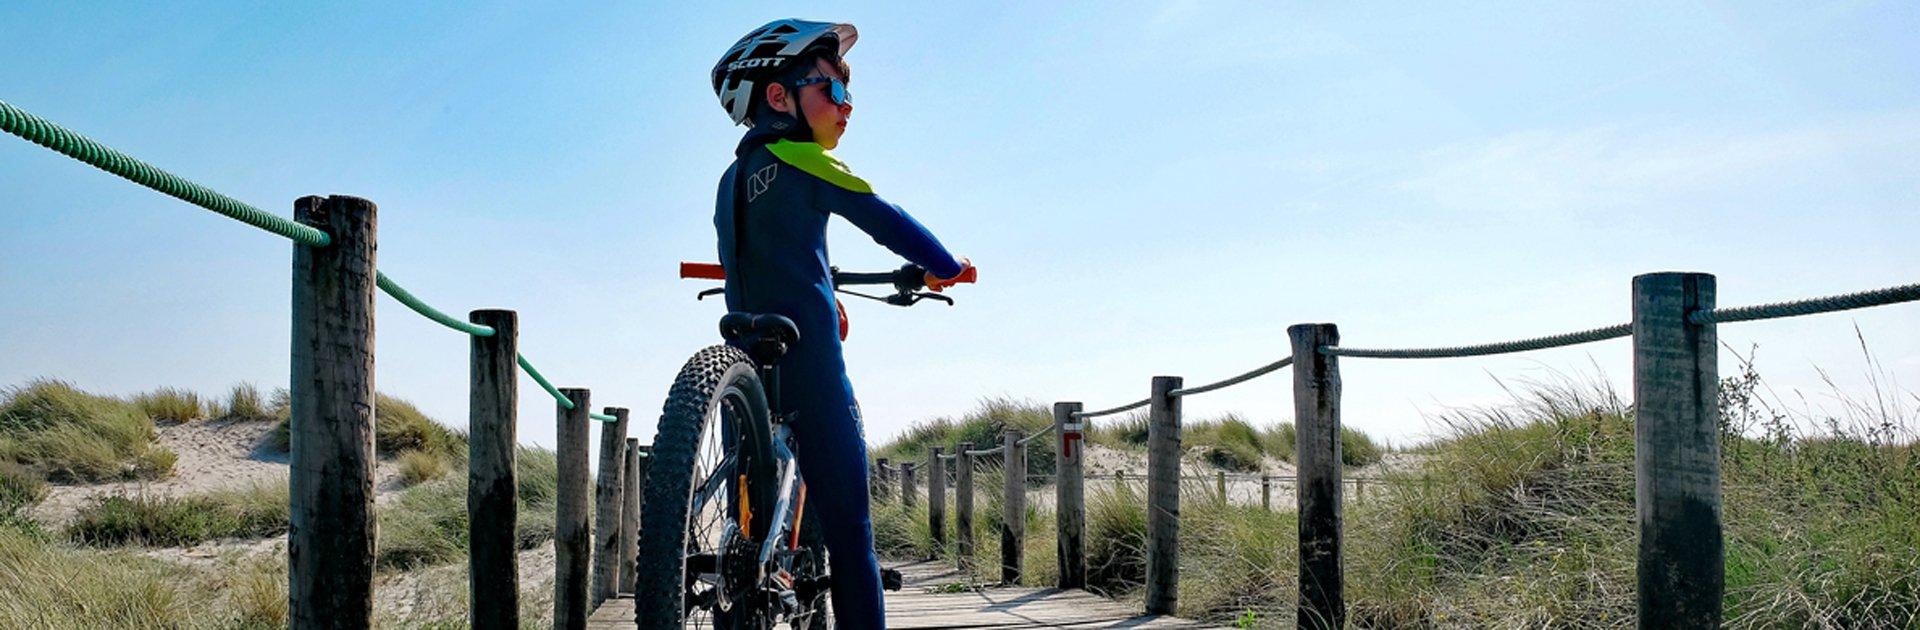 Aktivferien Nordportugal Junge mit Mountainbike